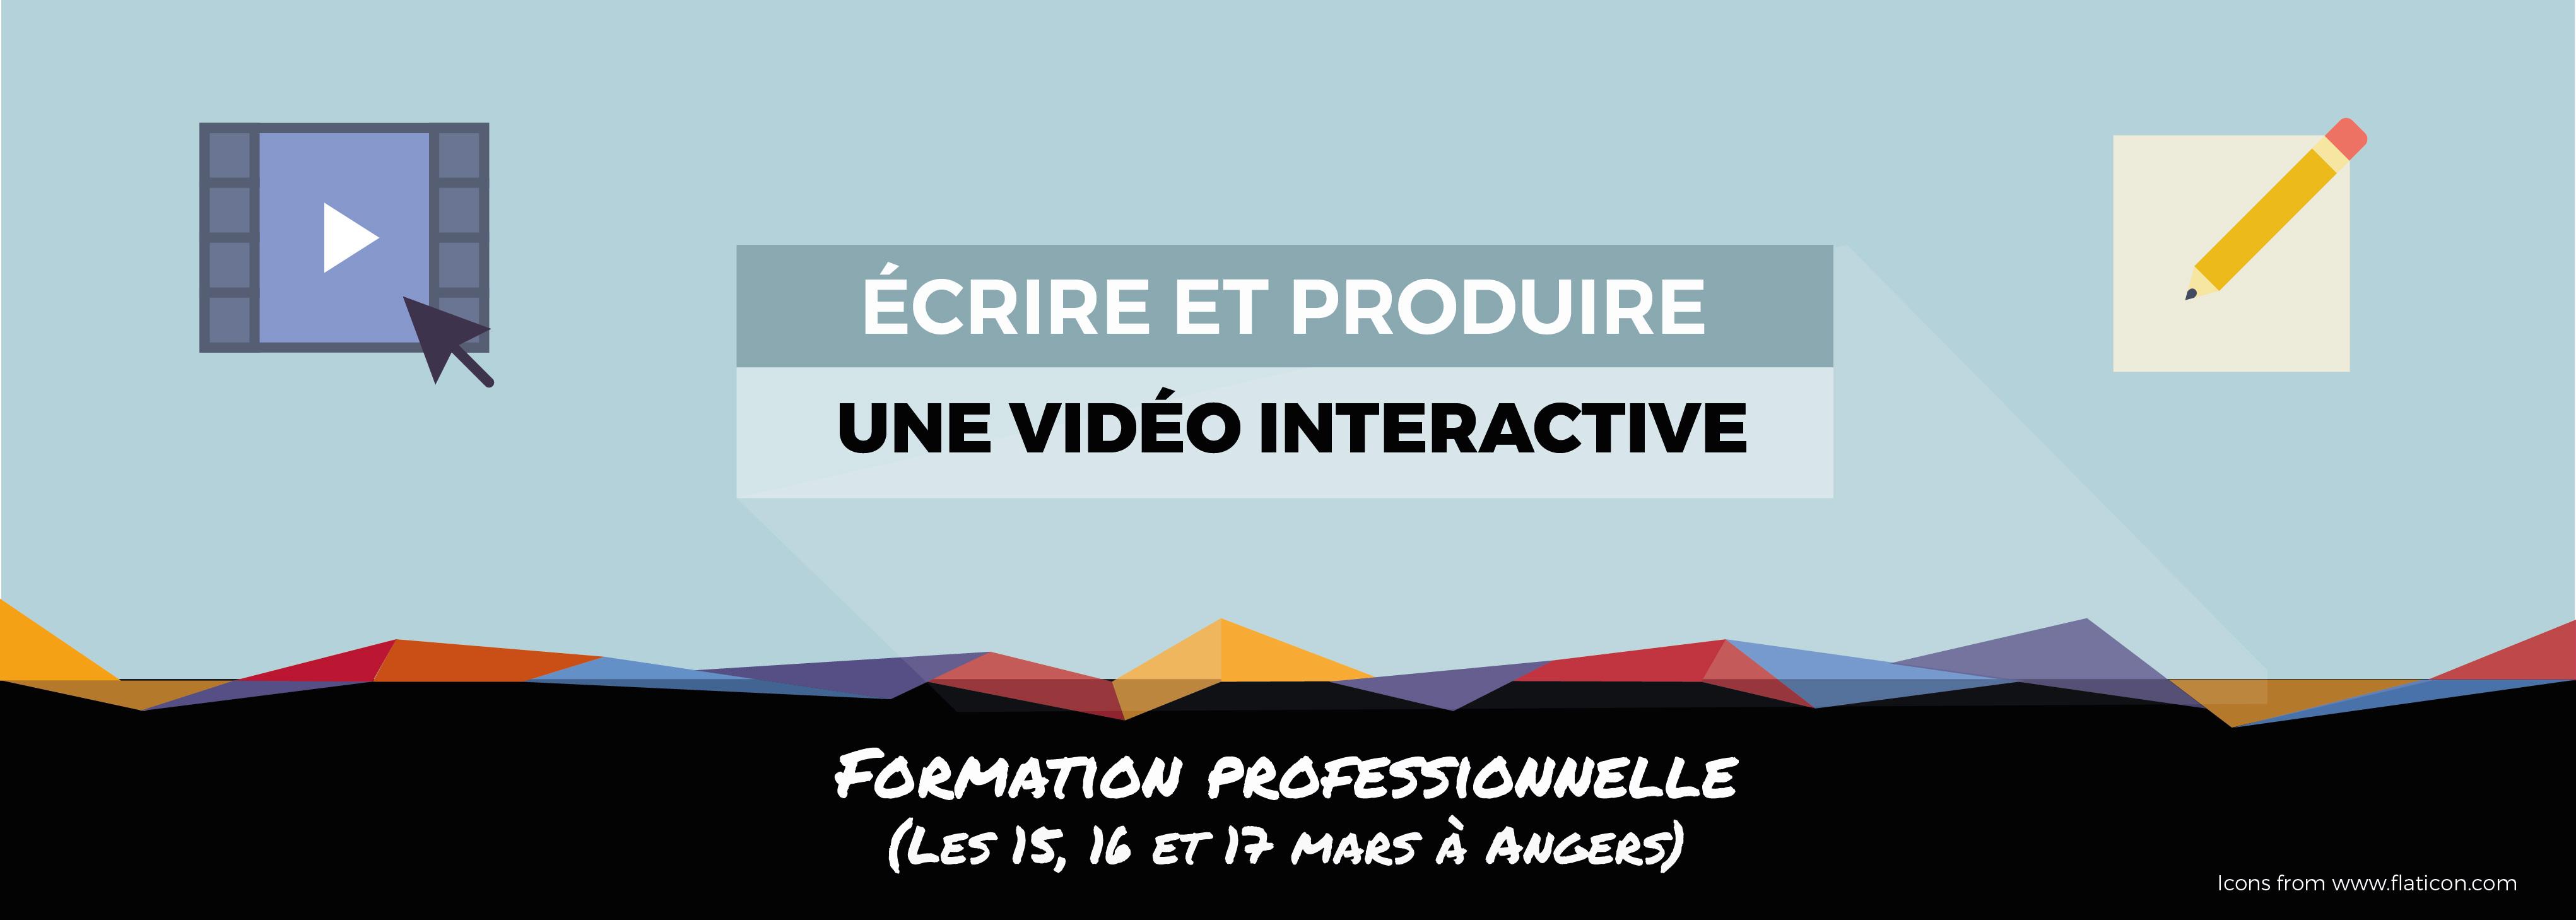 Slider-ecrire-et-produire-une-video-interactive-01